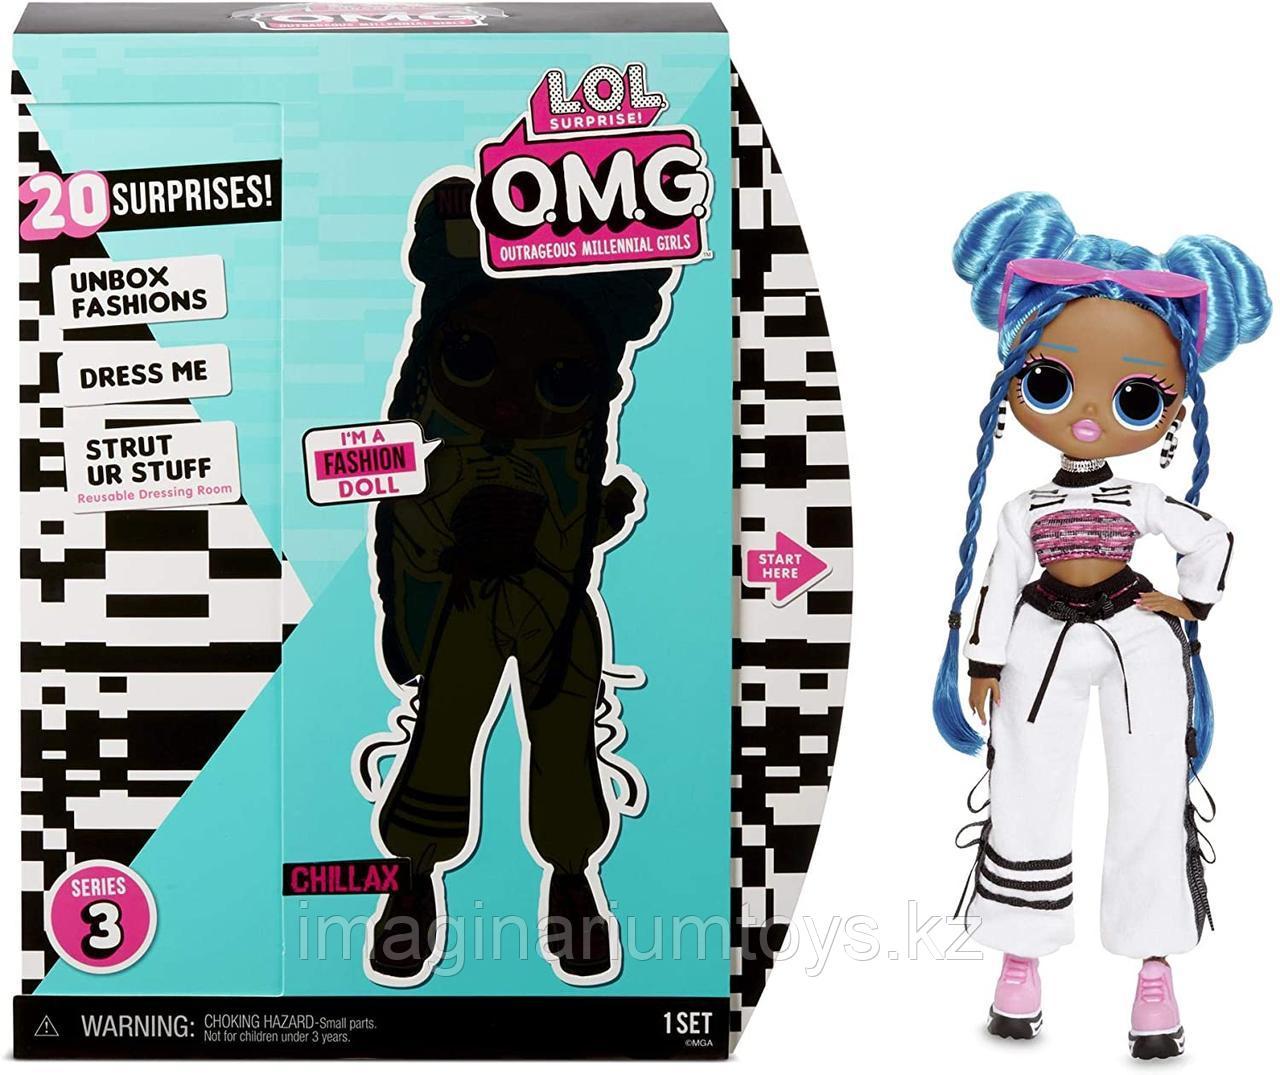 LOL Surprise OMG Chillax 3 серия Большая кукла ЛОЛ - фото 1